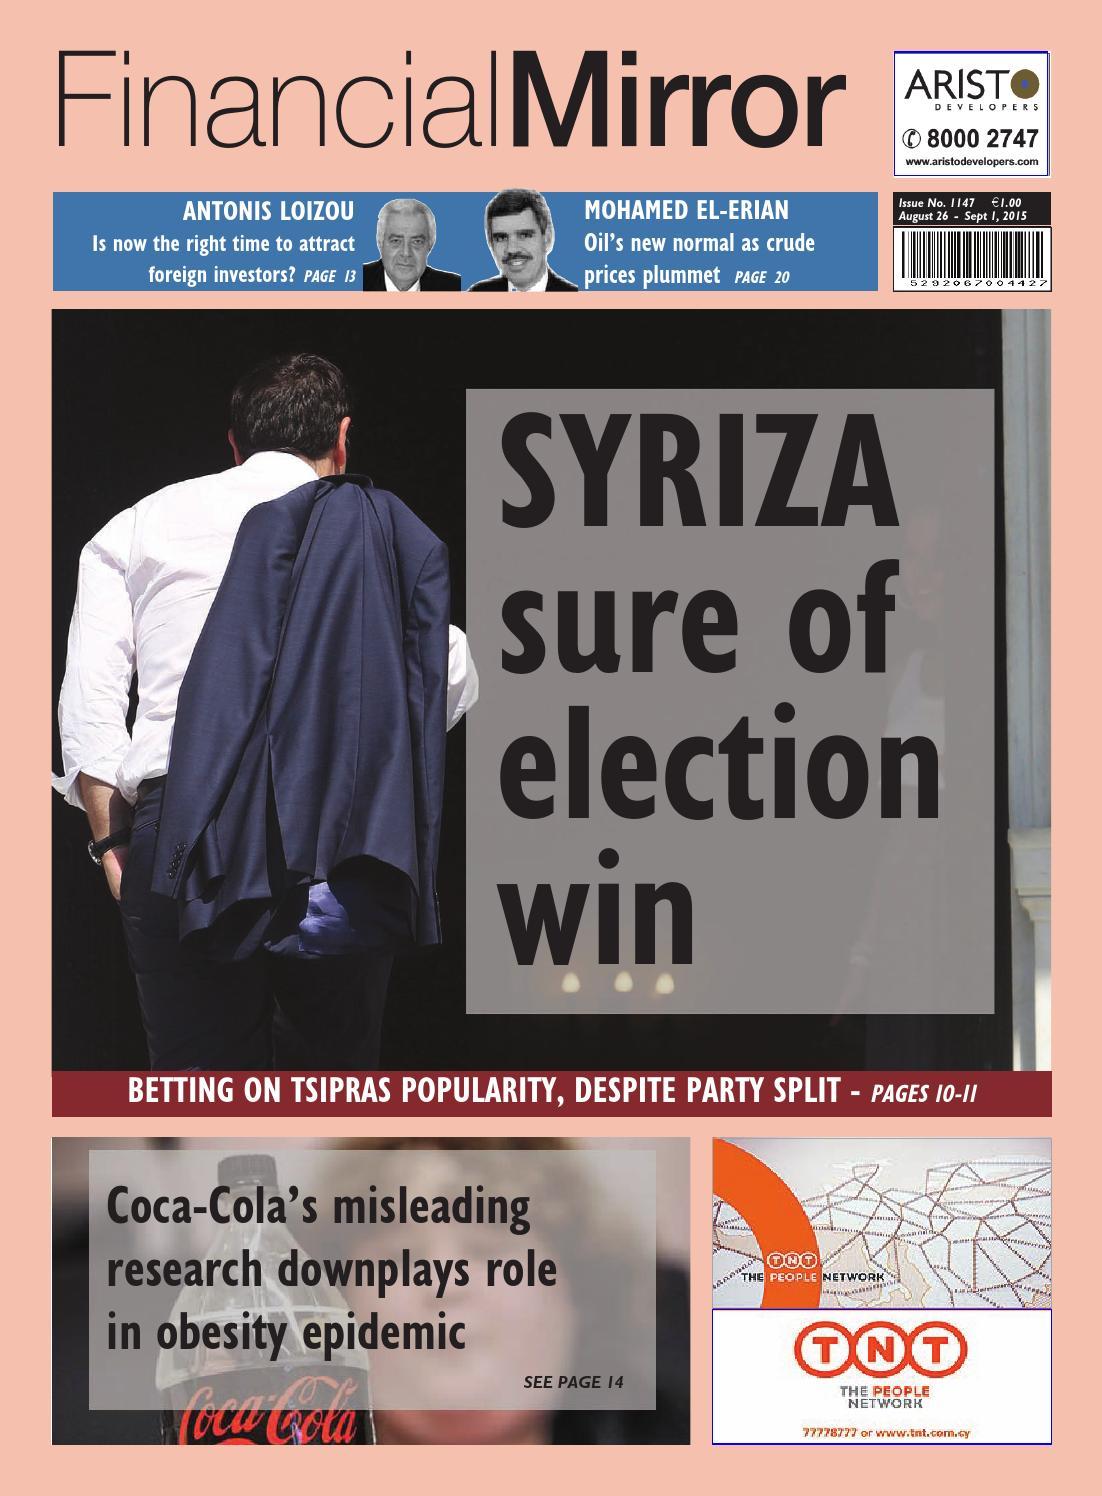 tsipras nicosia betting